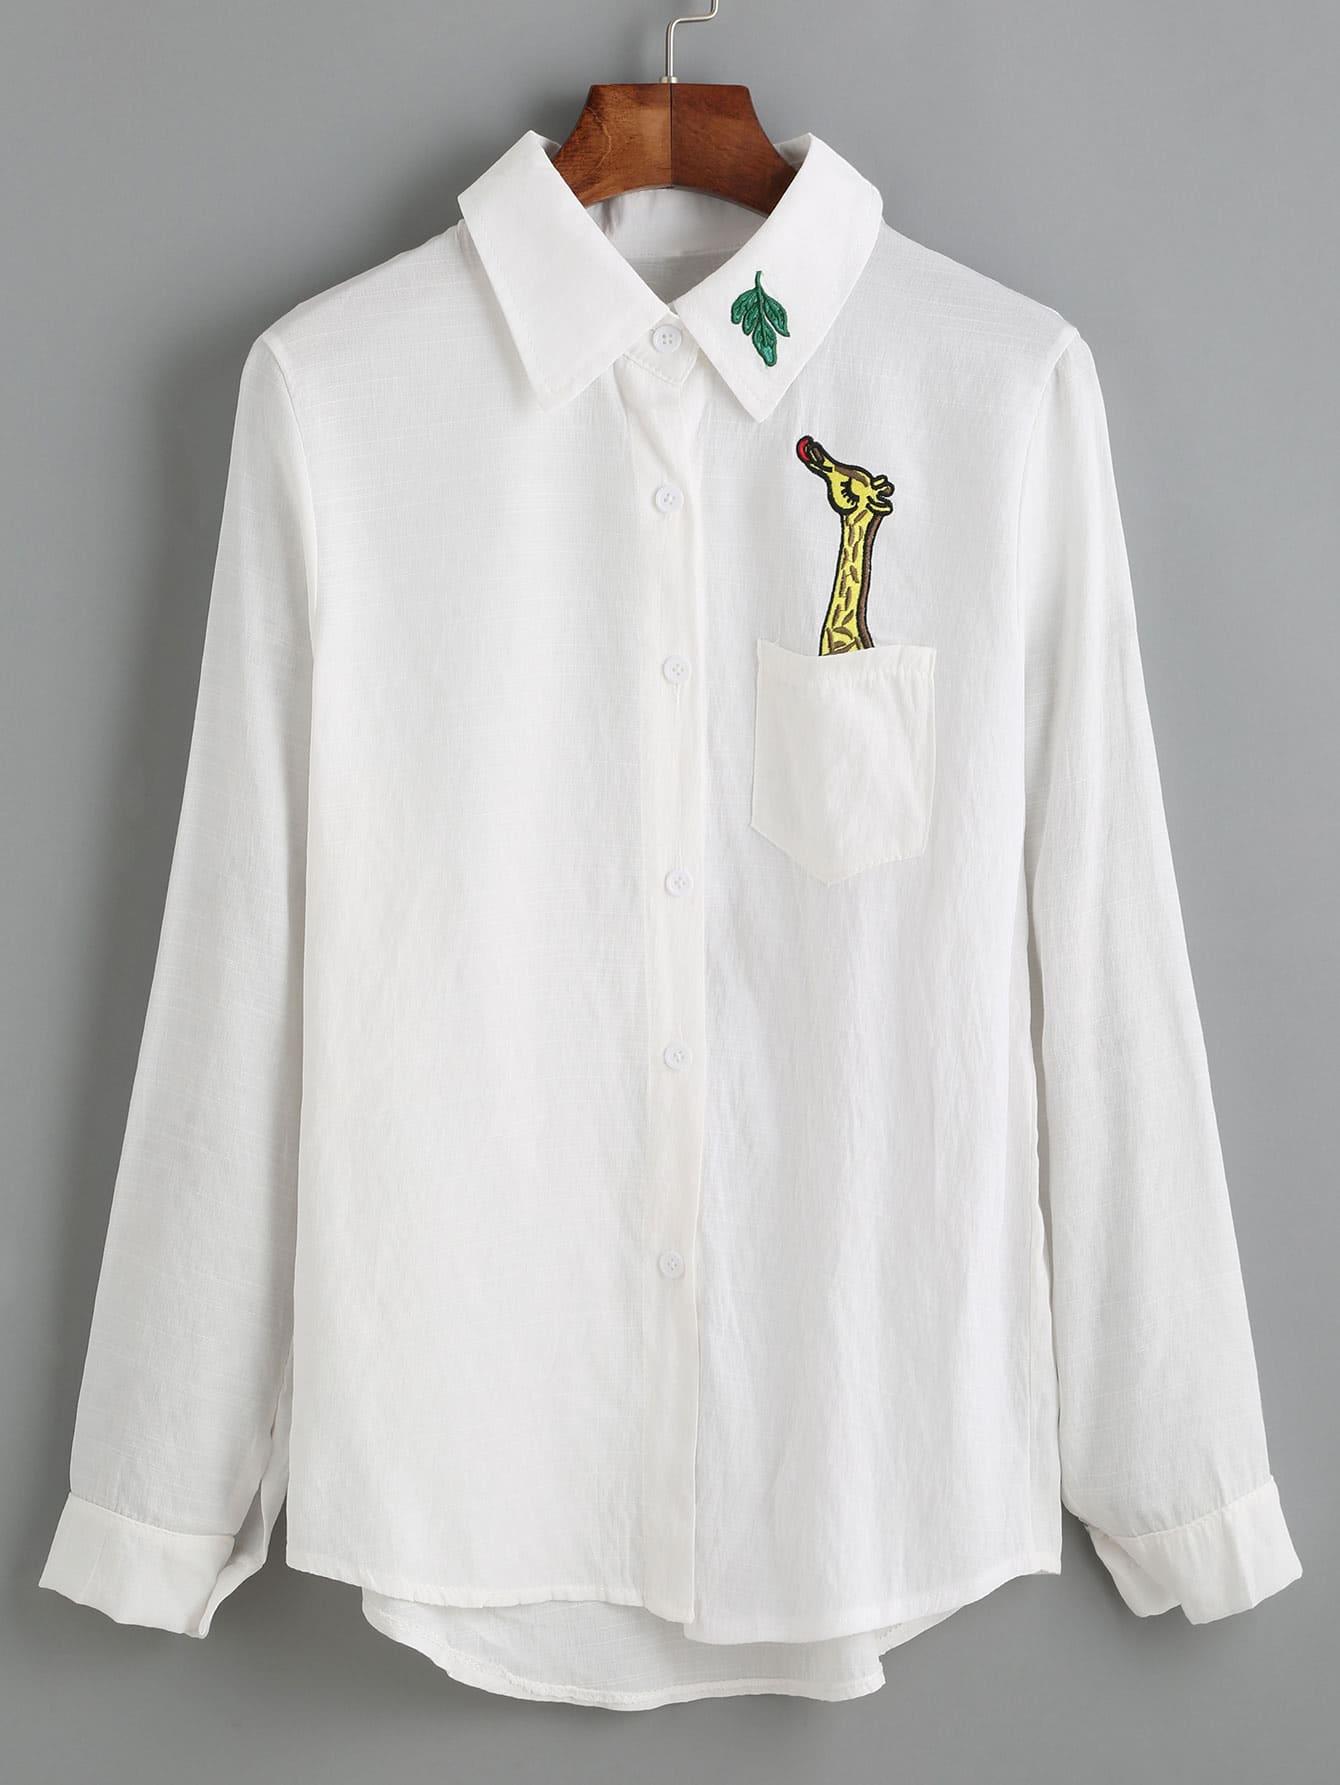 Giraffe Embroidered Dip Hem Shirt With Chest Pocket RBLO160803122